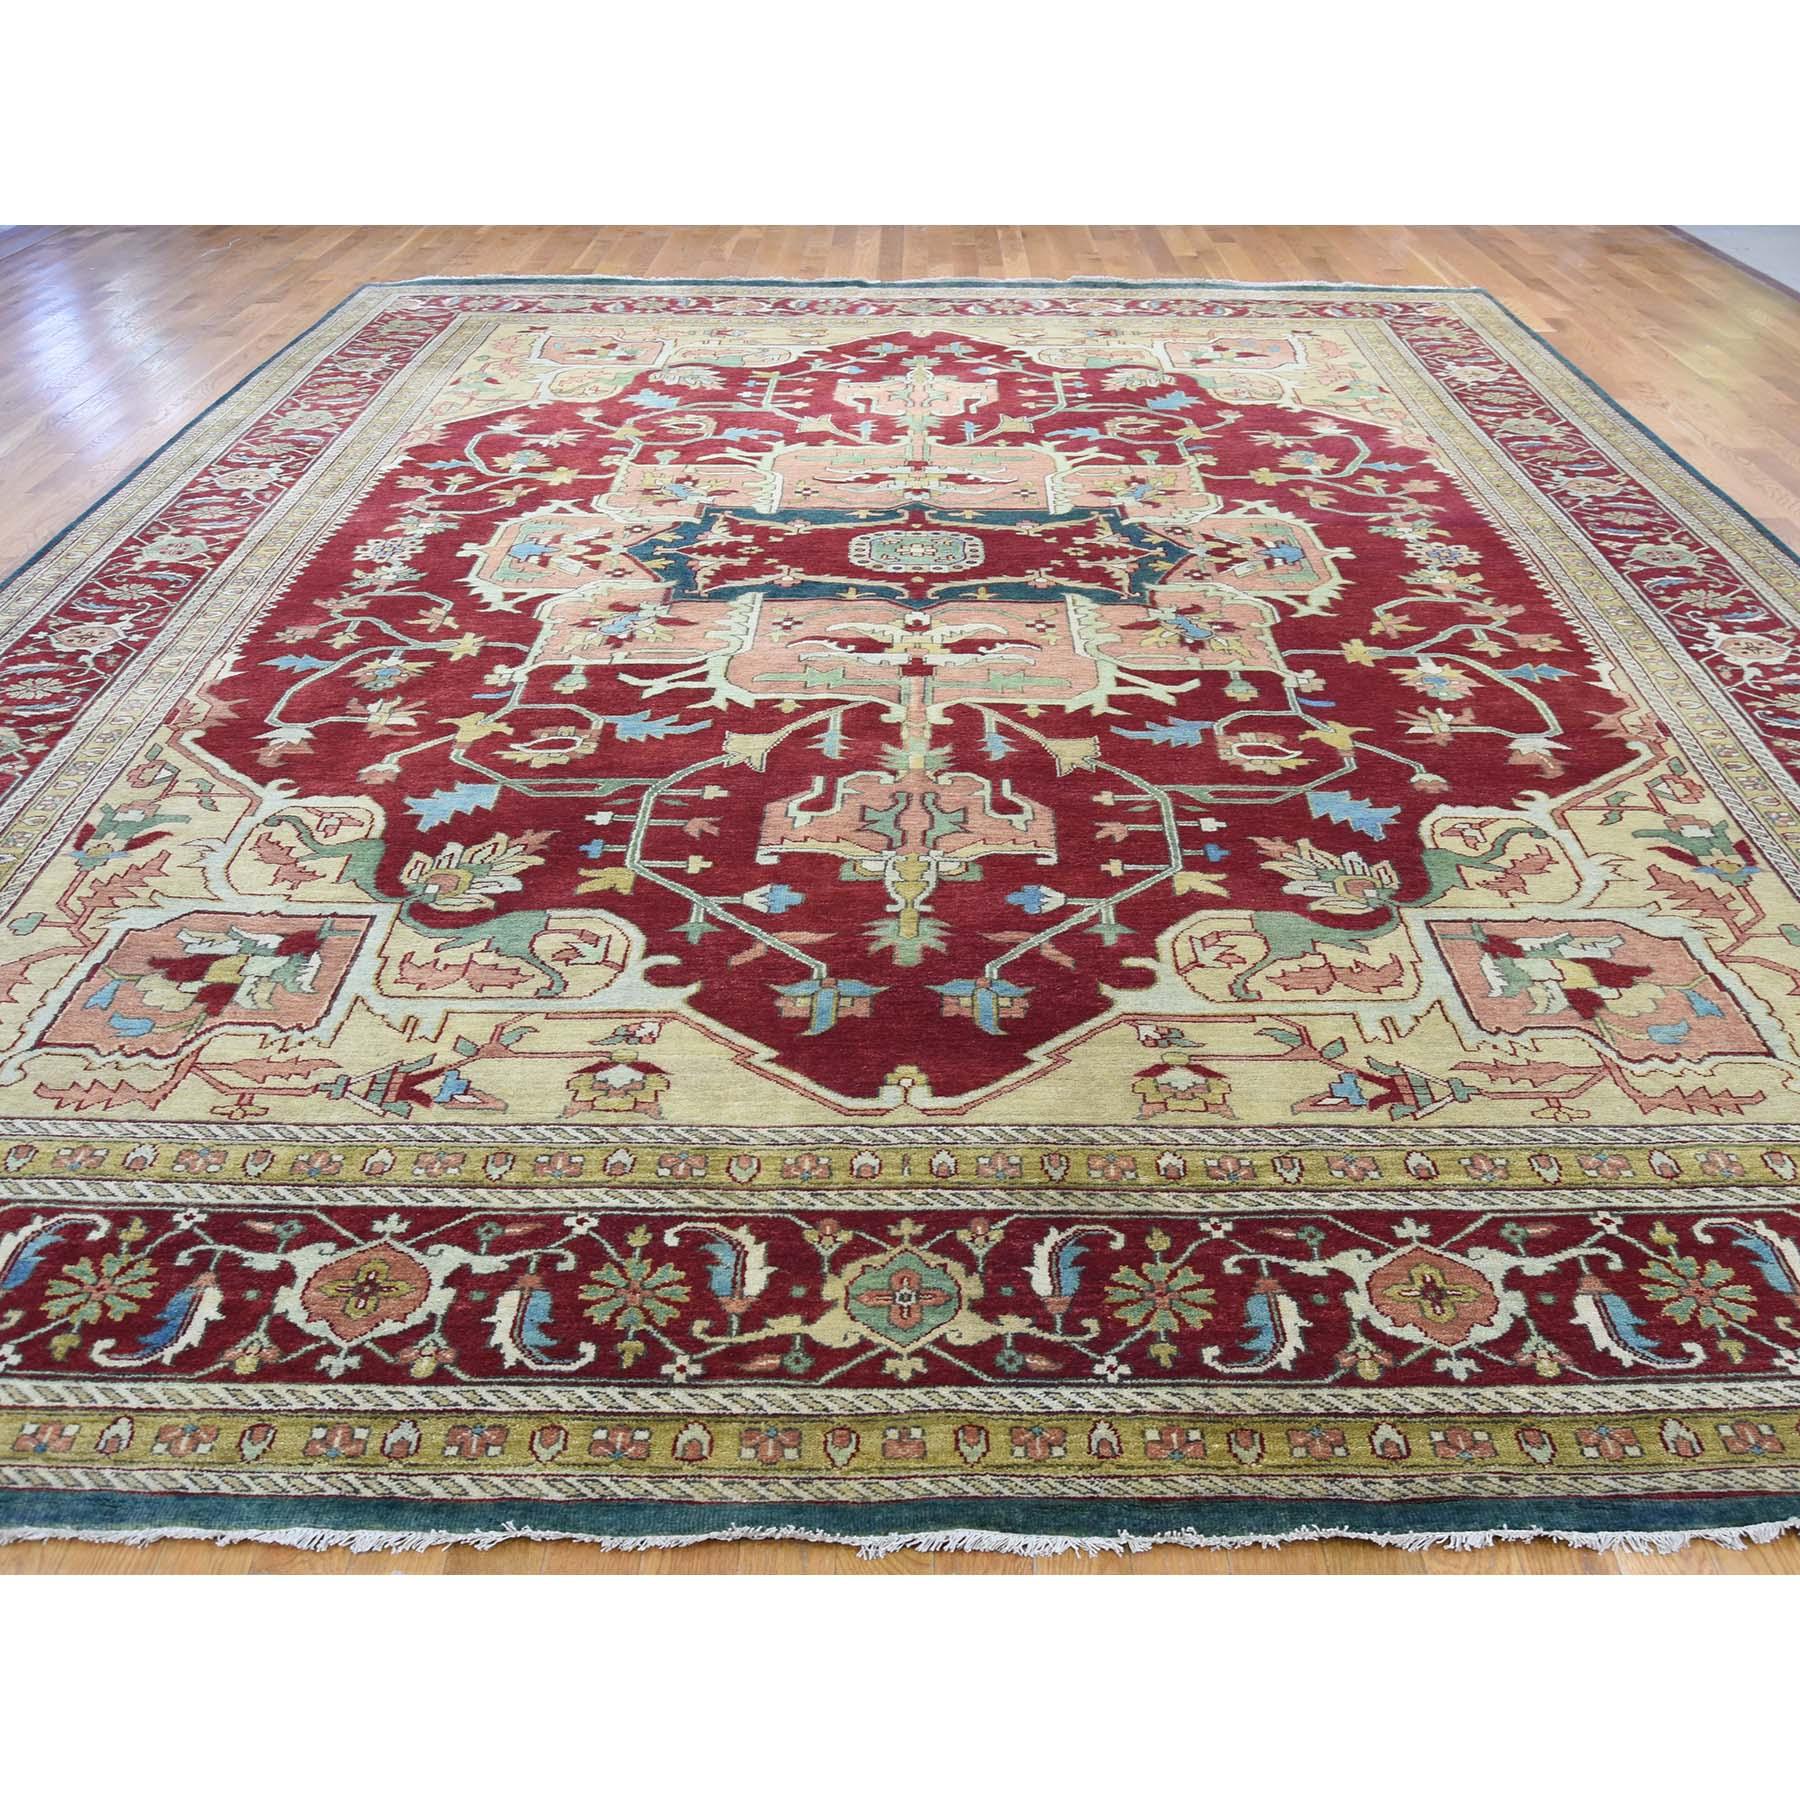 11-8 x14-7  Heriz Design Hand-Knotted 100 Percent Wool Oriental Oversize Rug